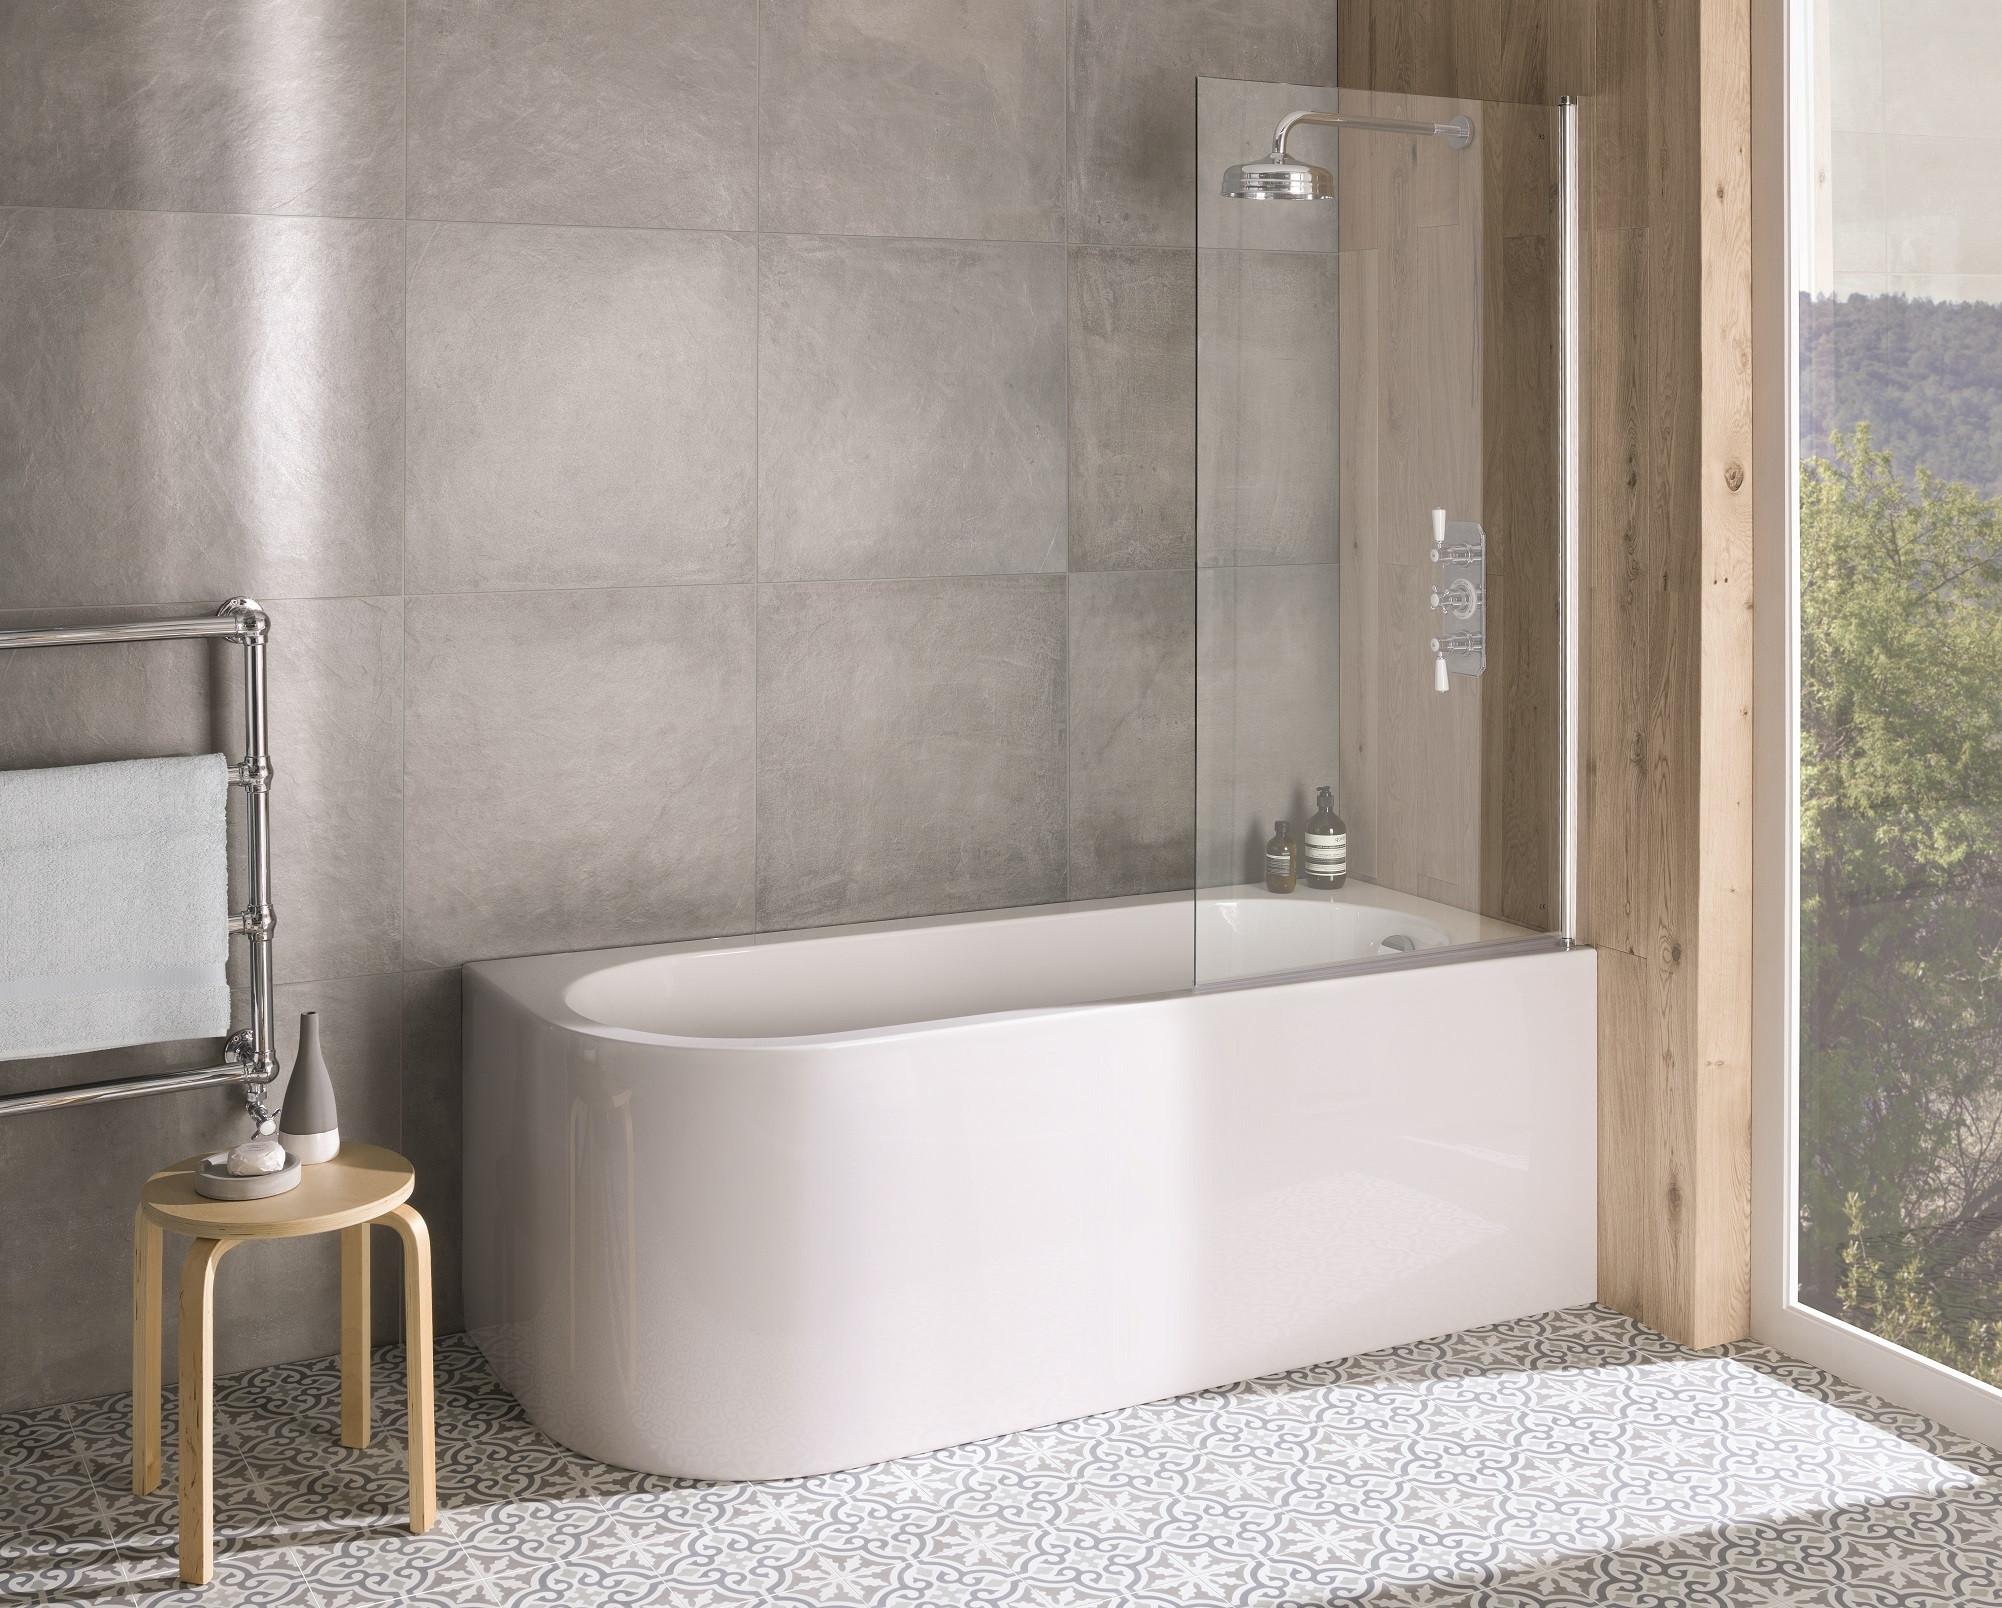 Bc Designs Ancorner Right Hand Shower Bath 1700mm X 750mm